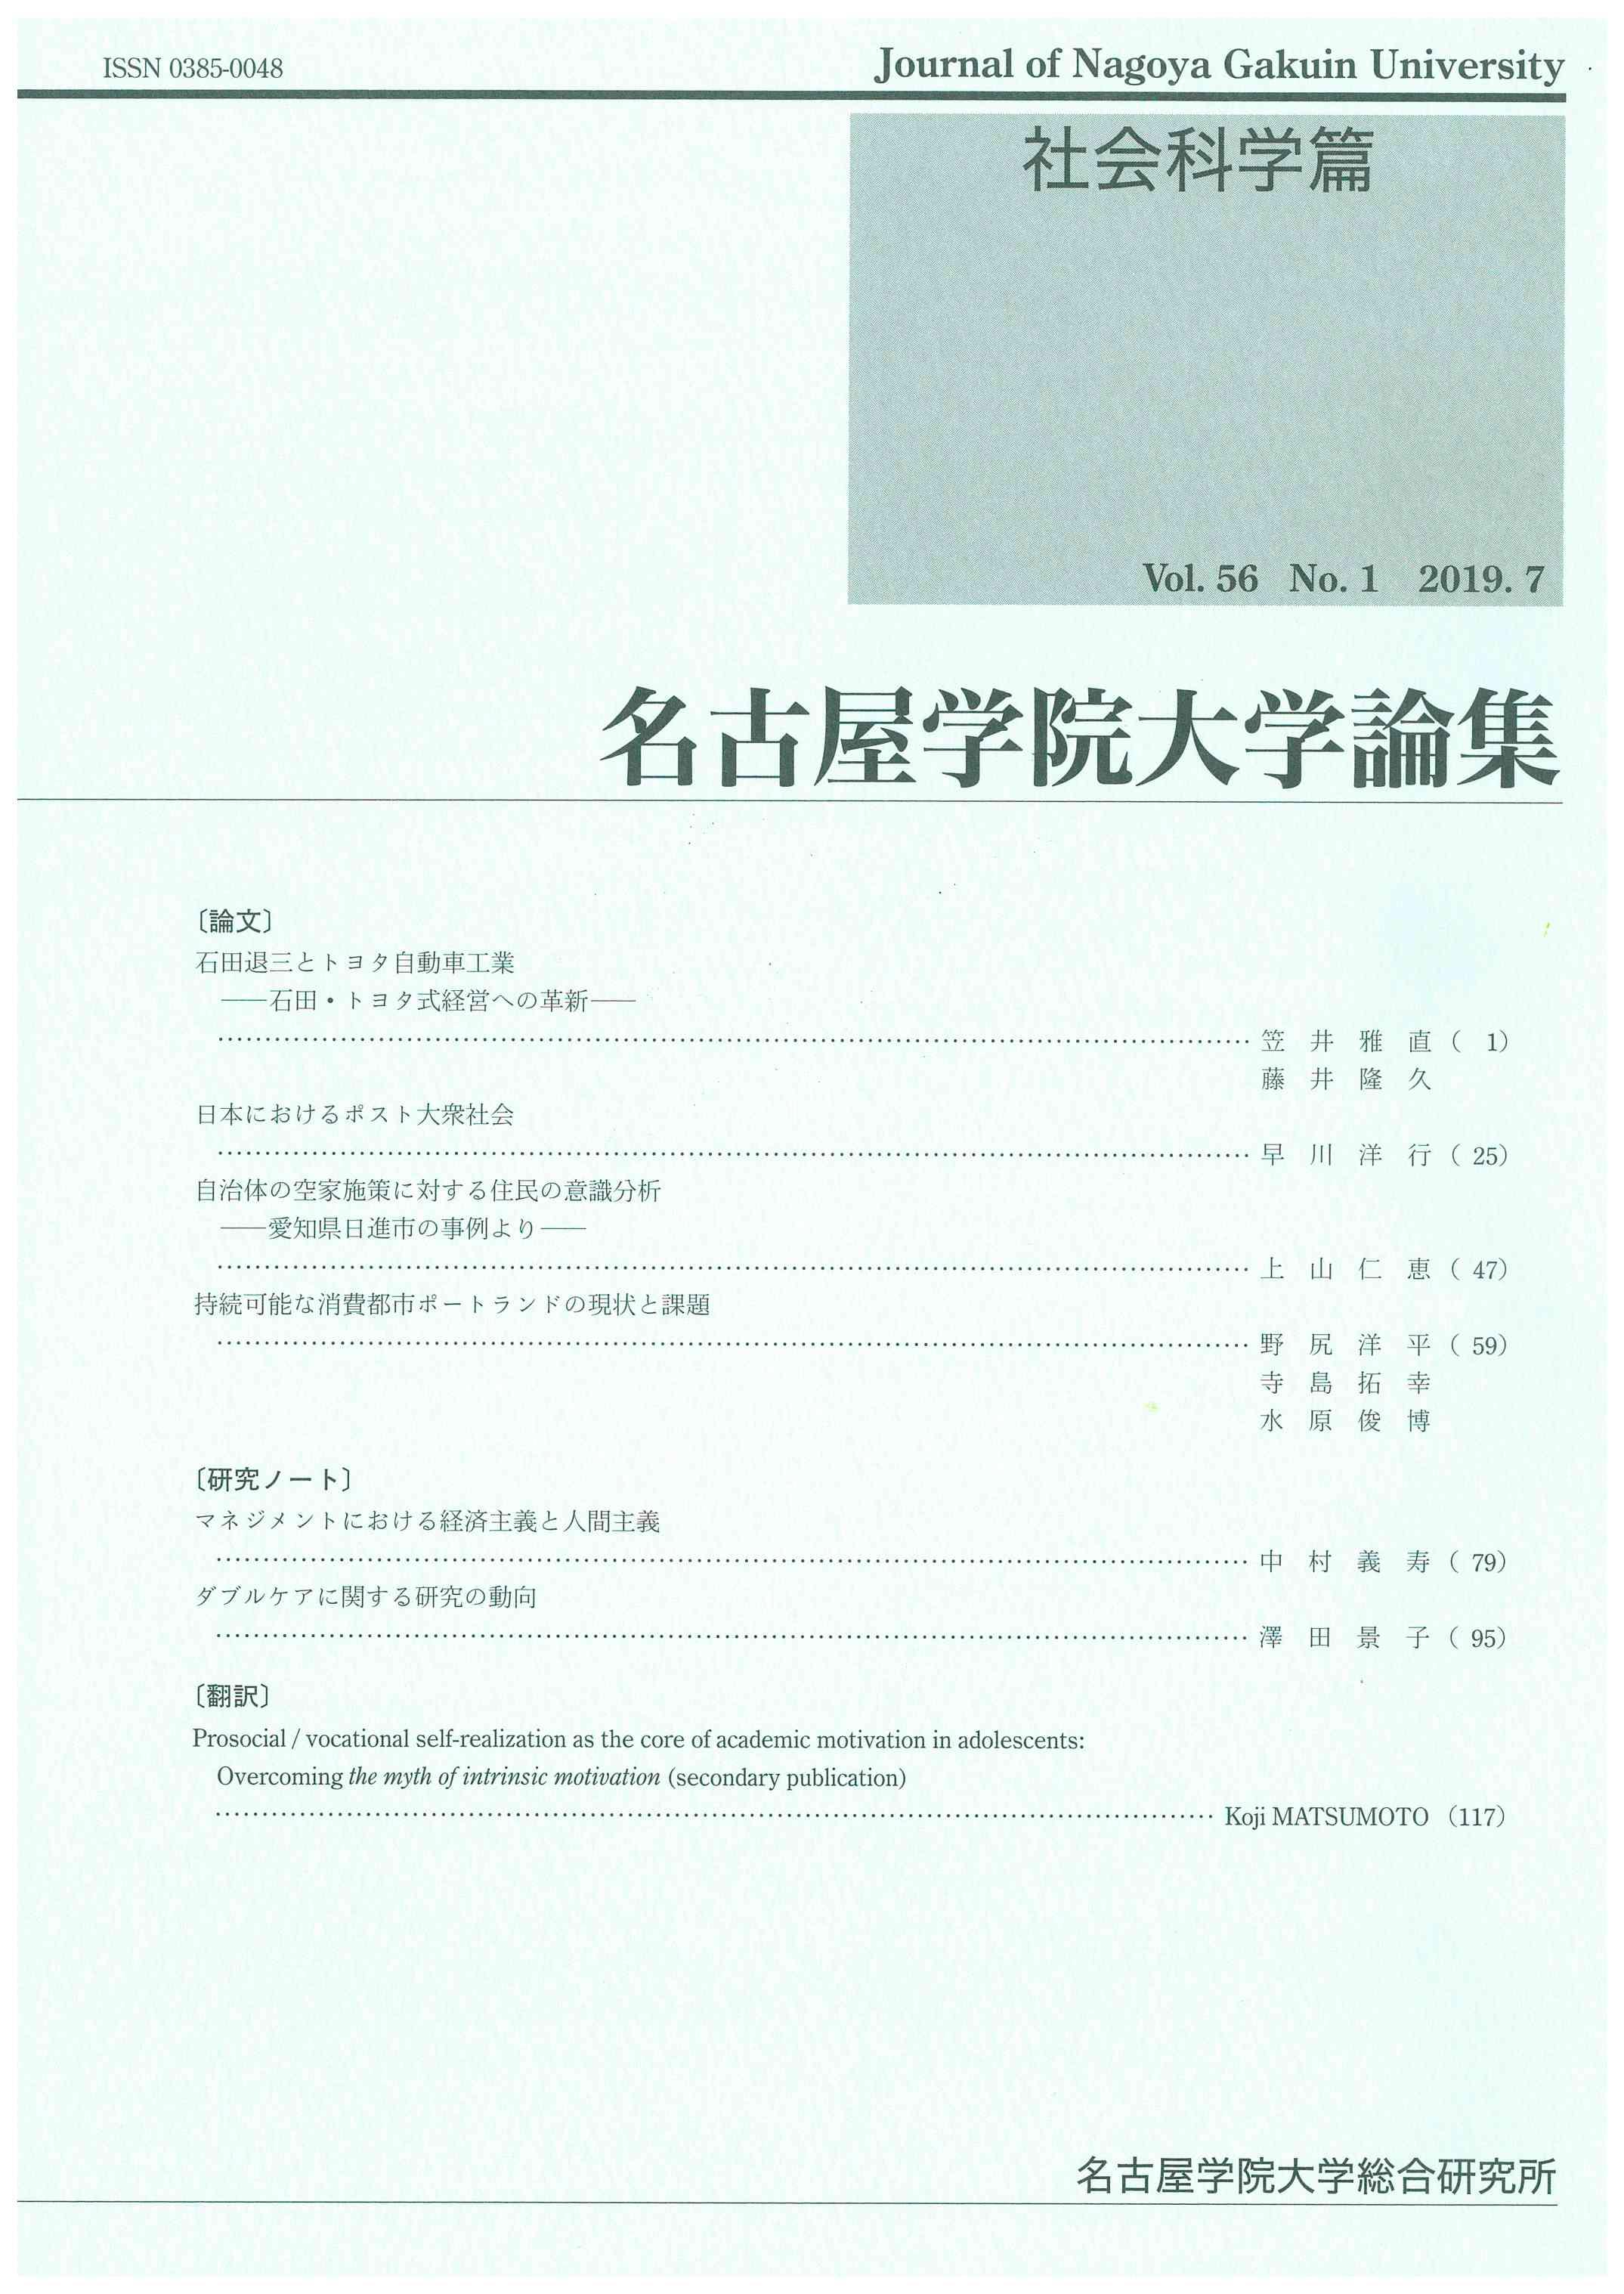 shakai56-1.jpg